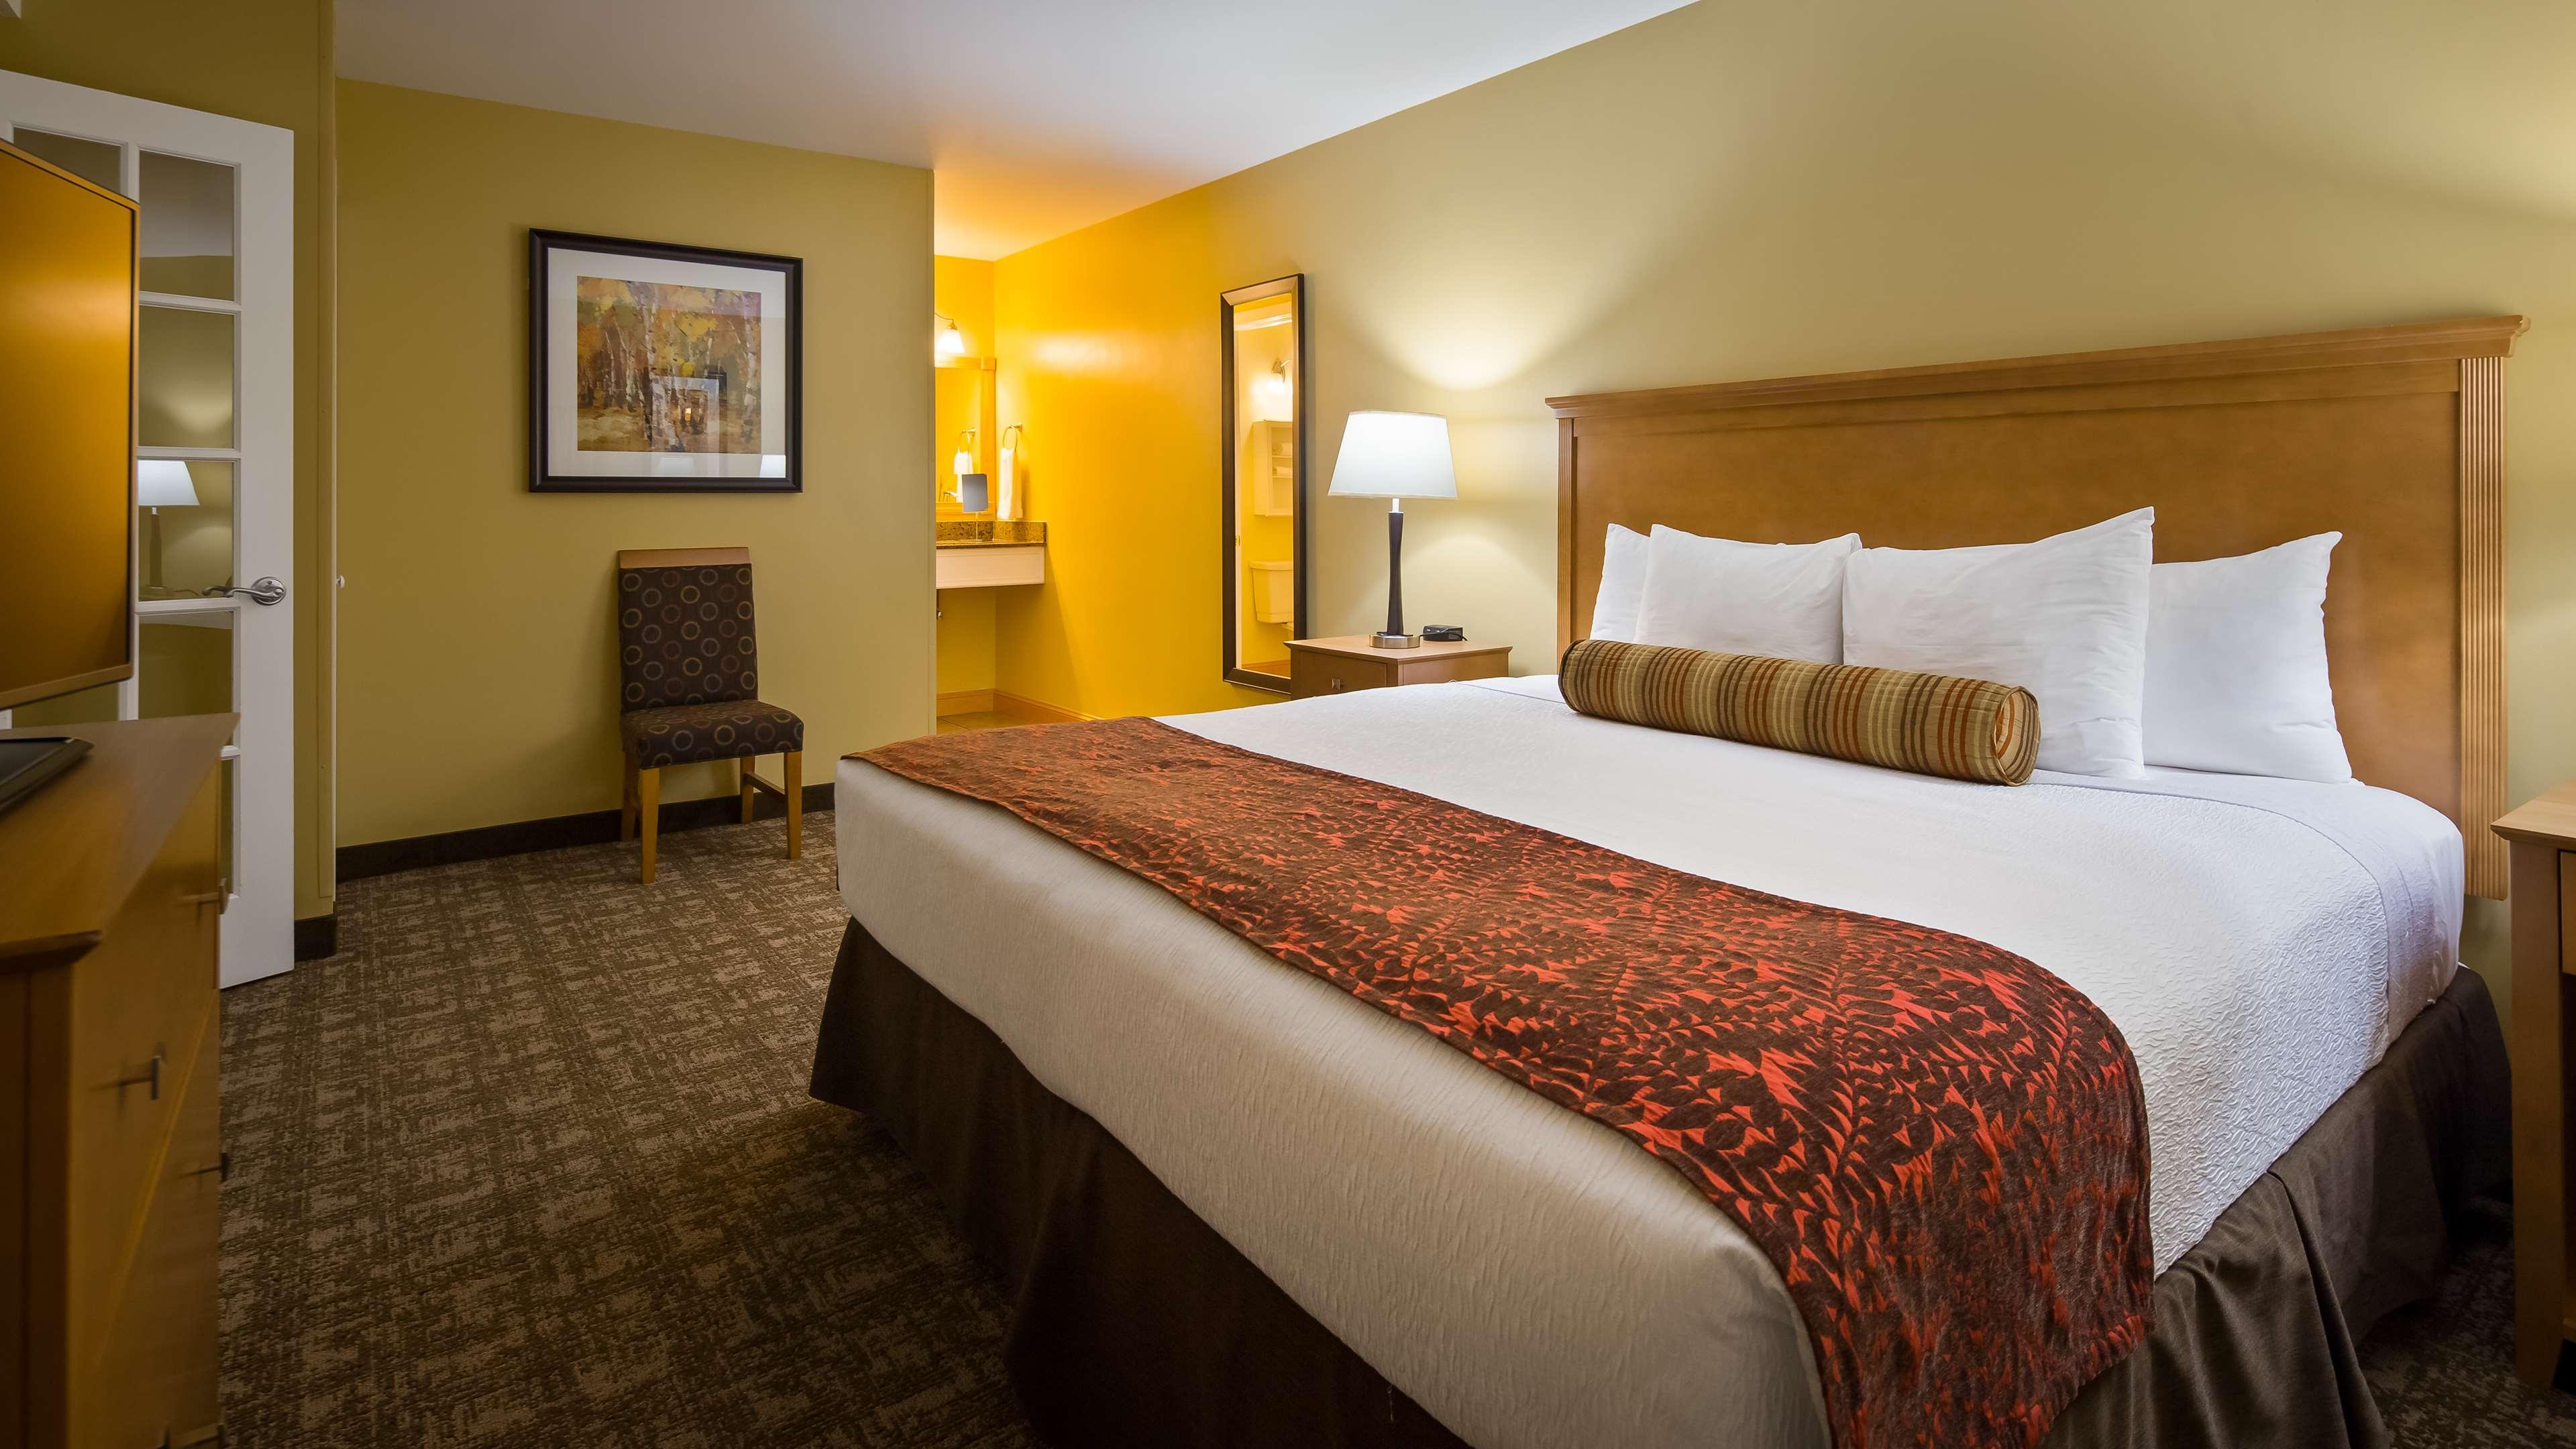 Best Western Plus Windjammer Inn & Conference Center image 22